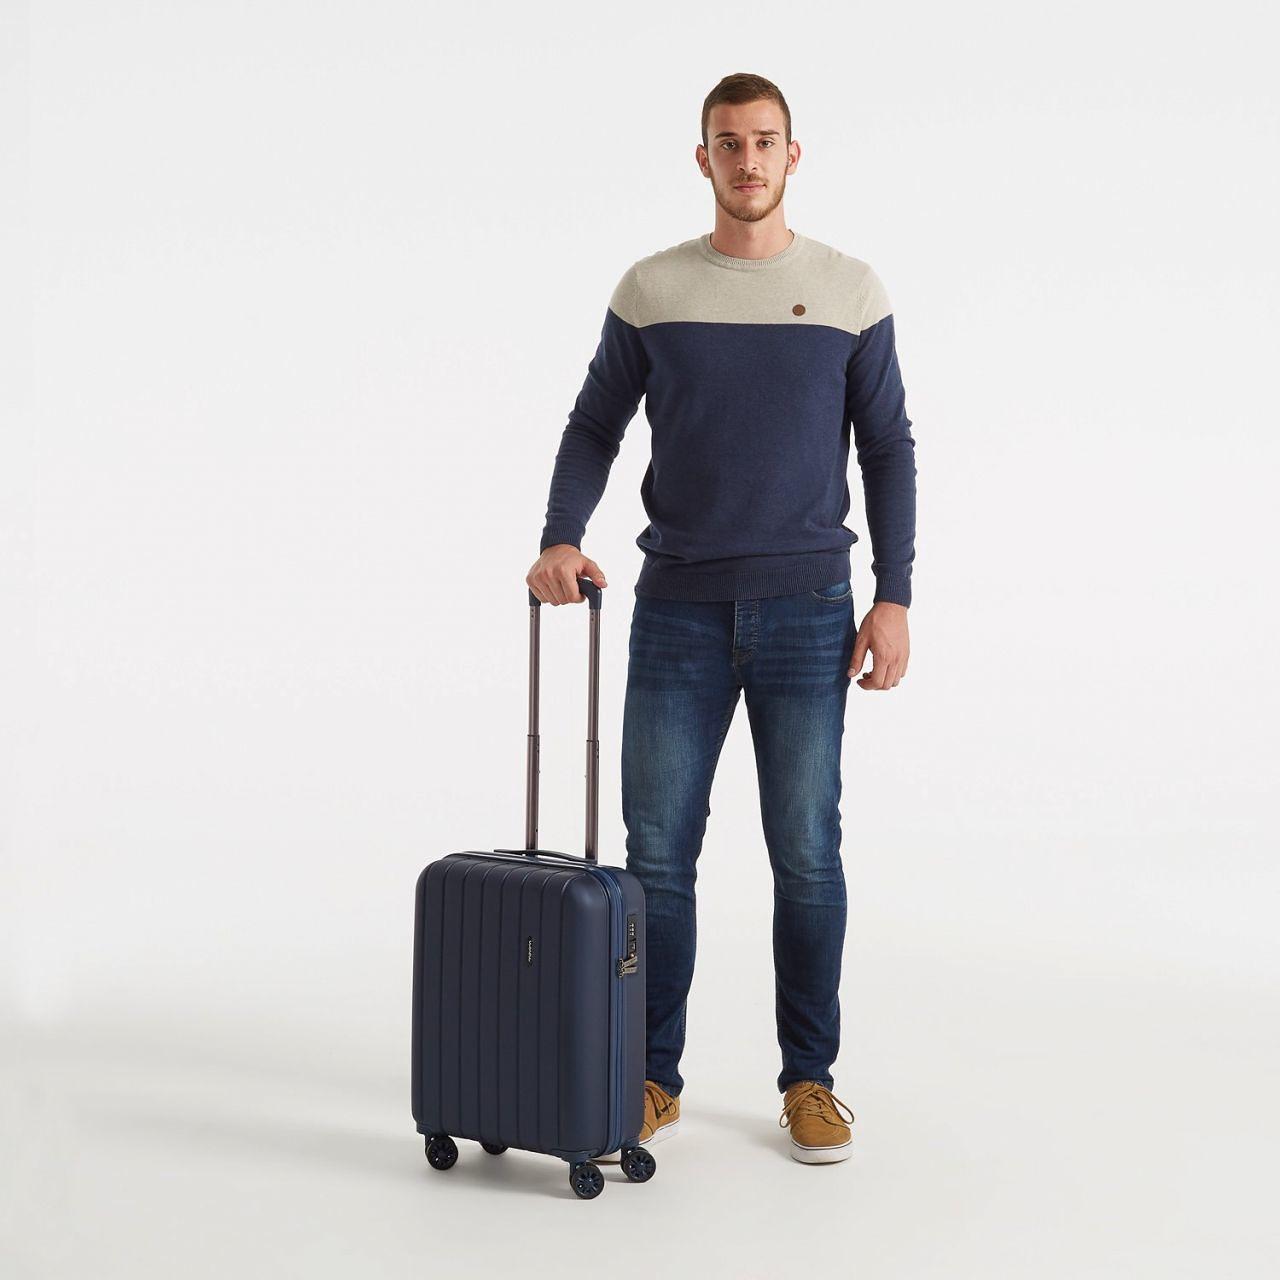 maleta de cabina rígida